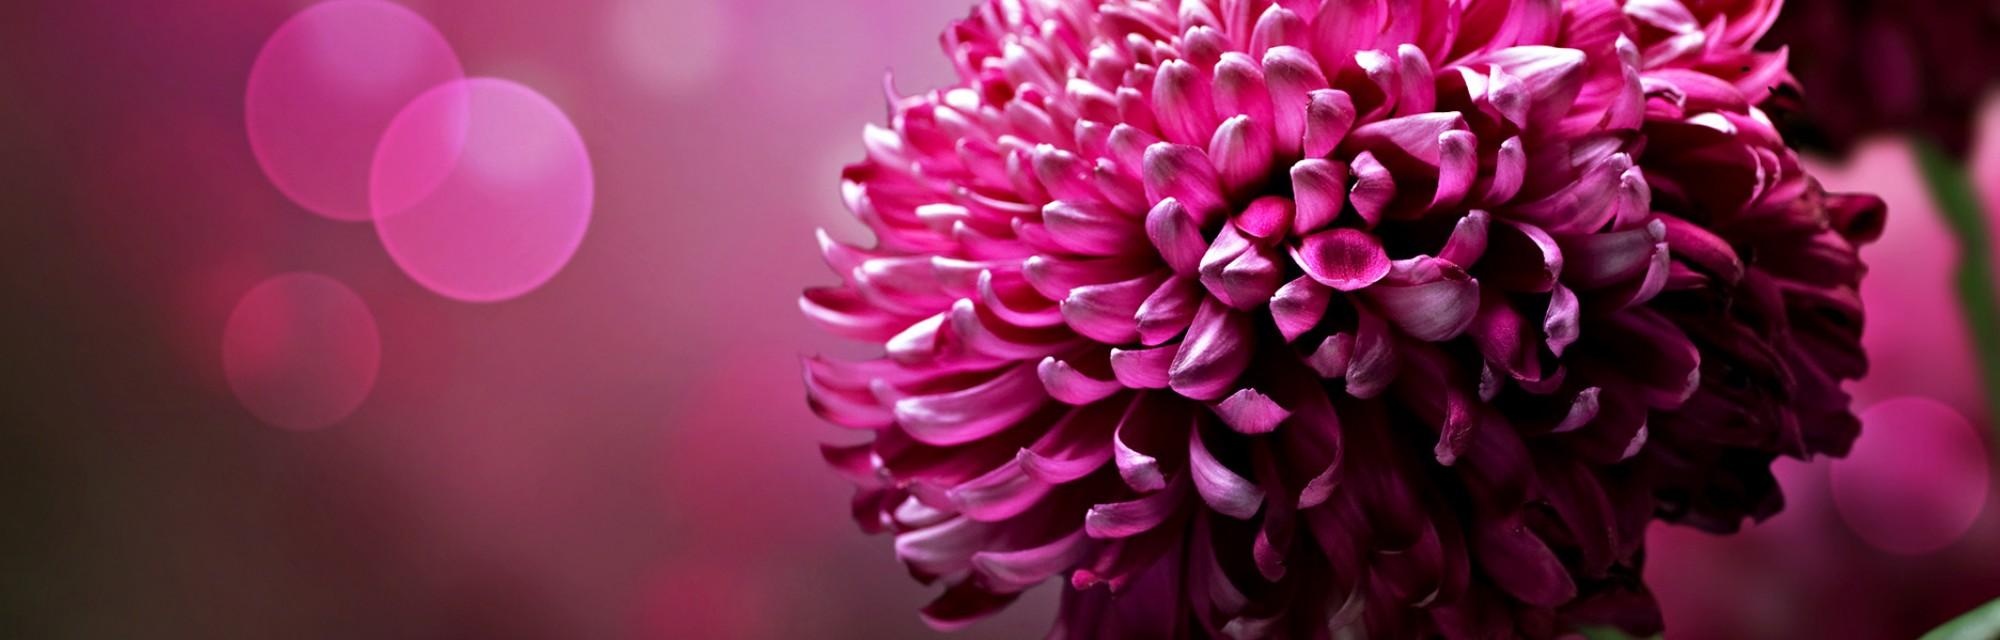 Natyra na bekoi me ngjyra, ne i sollem ato tek ju